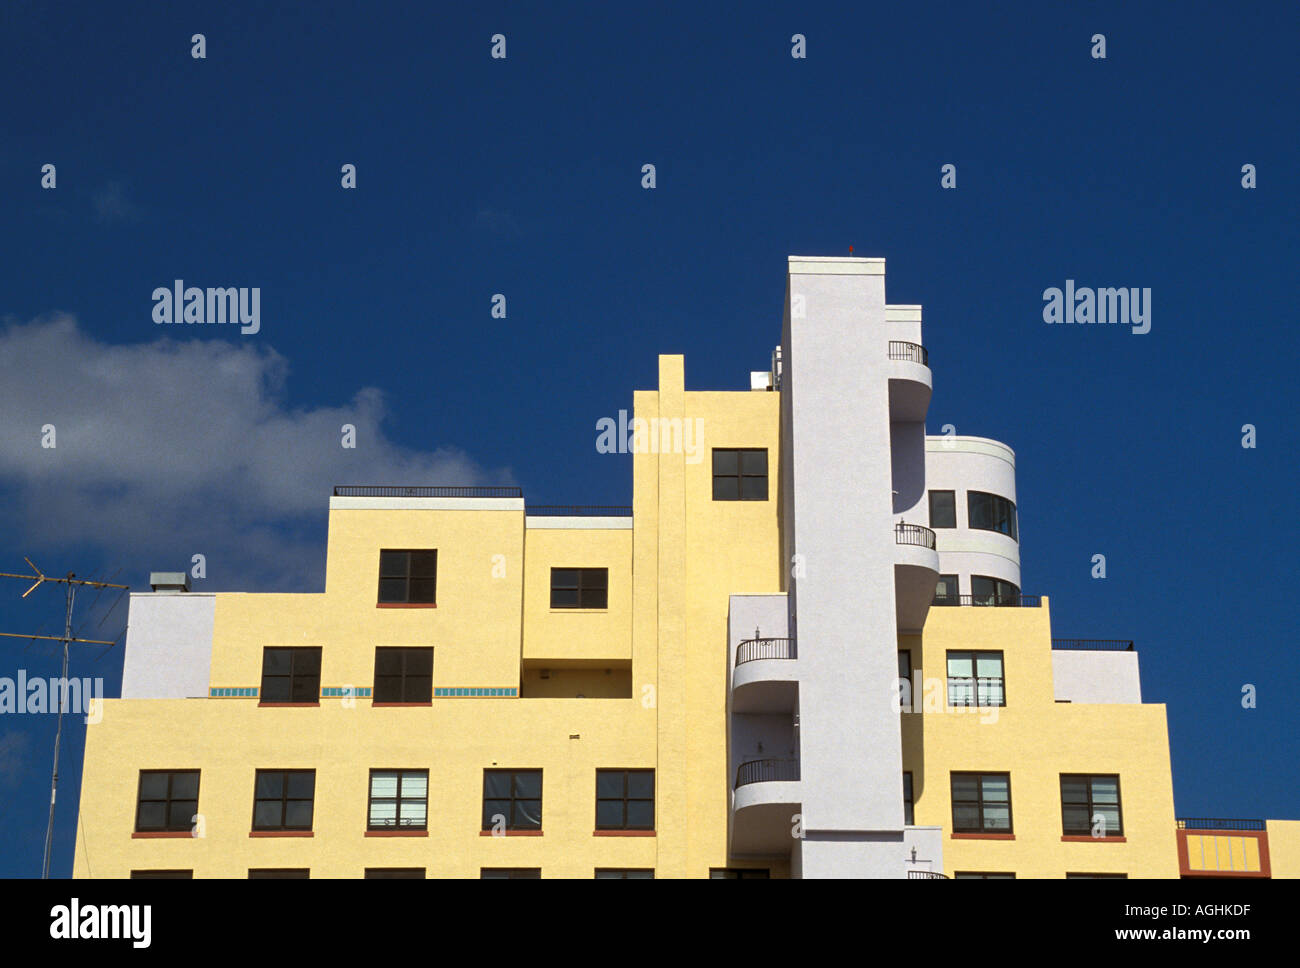 Miami Florida FL South Beach Classic Art Deco Architecture Ocean Drive yellow and white building - Stock Image